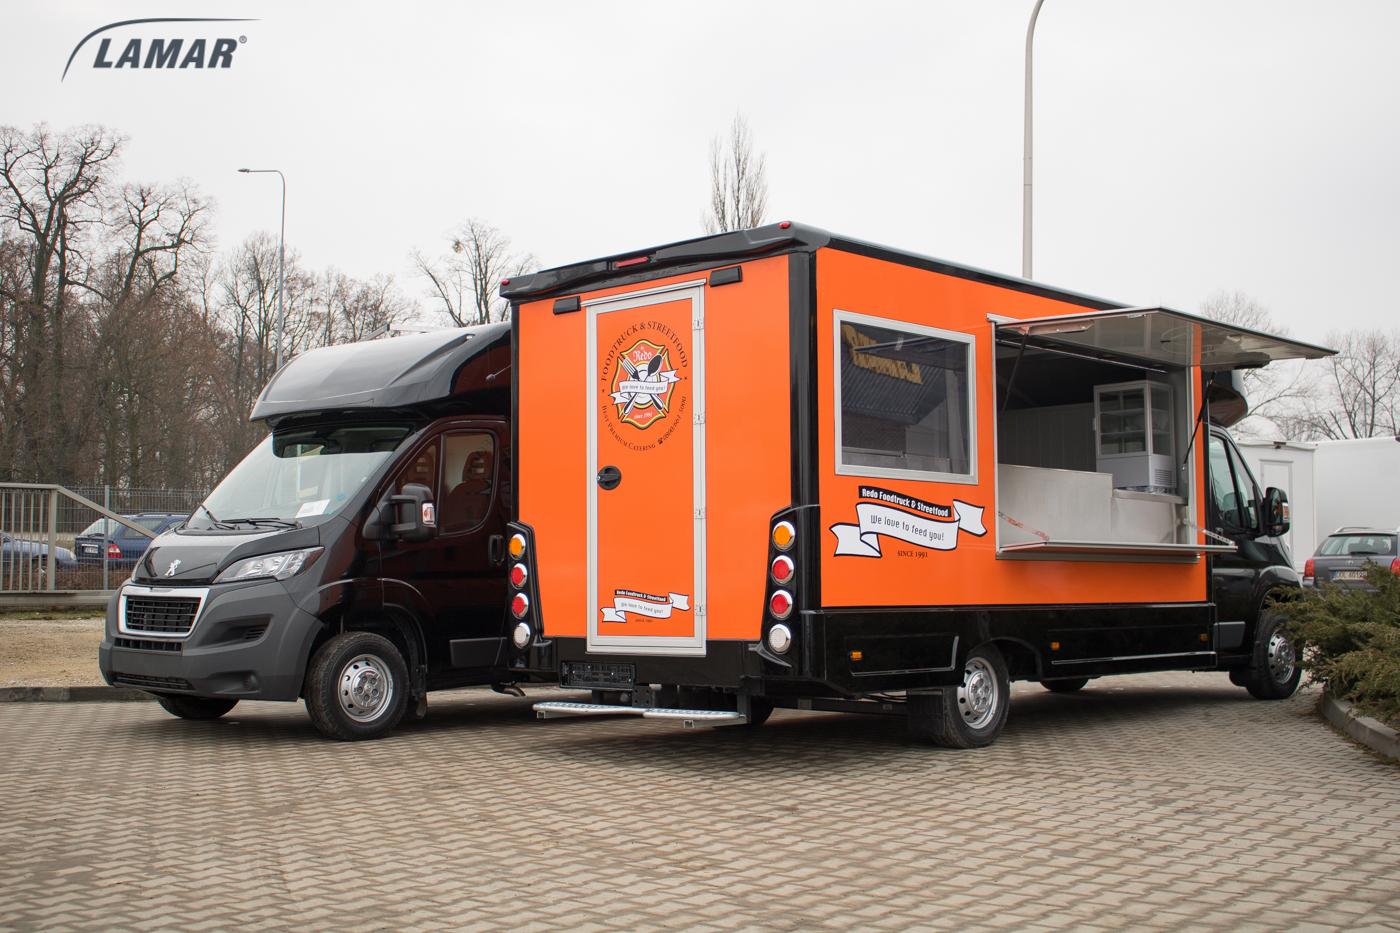 food truck mobile restaurant lamar lambox. Black Bedroom Furniture Sets. Home Design Ideas